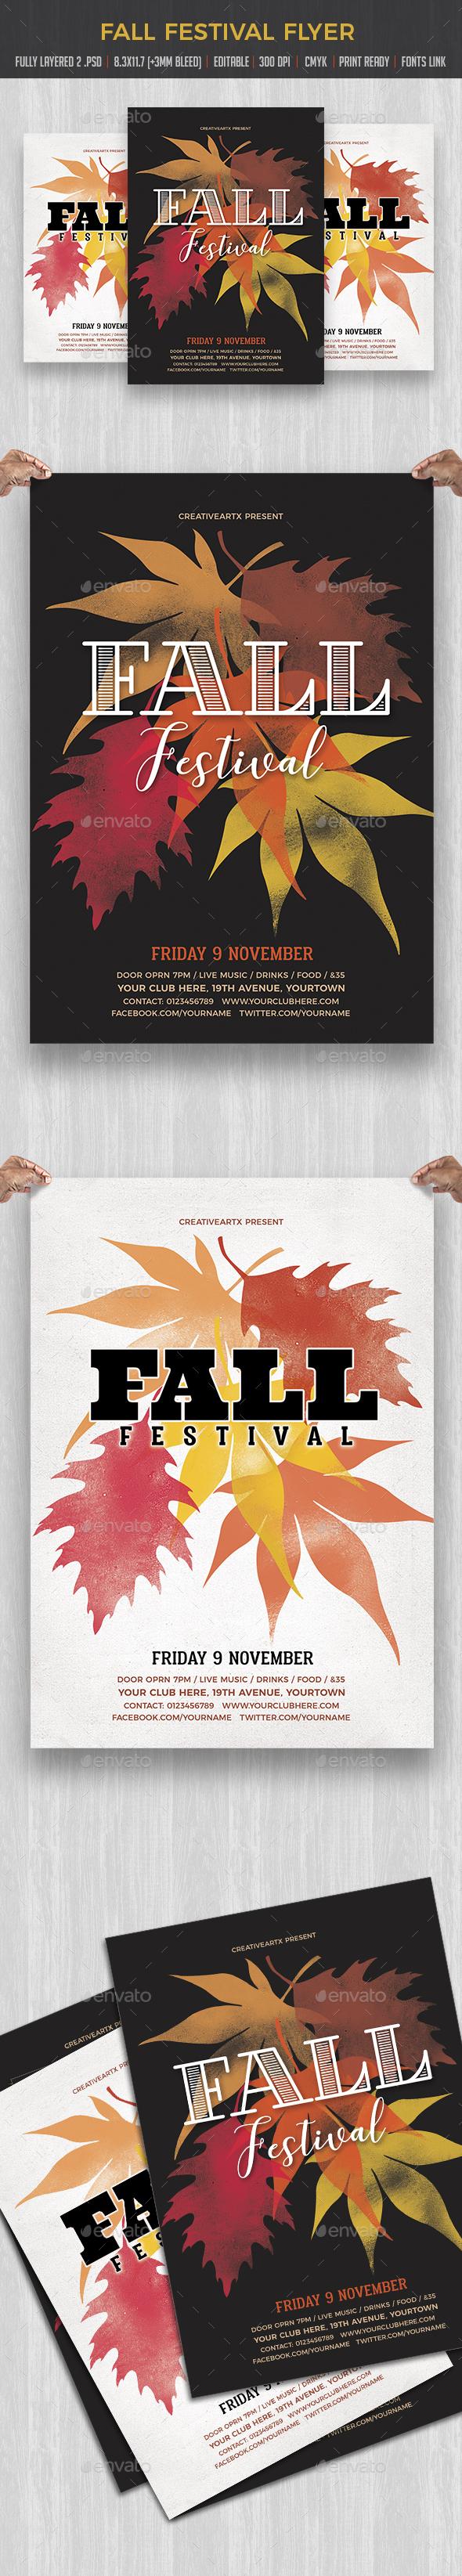 Fall Festival - Flyers Print Templates